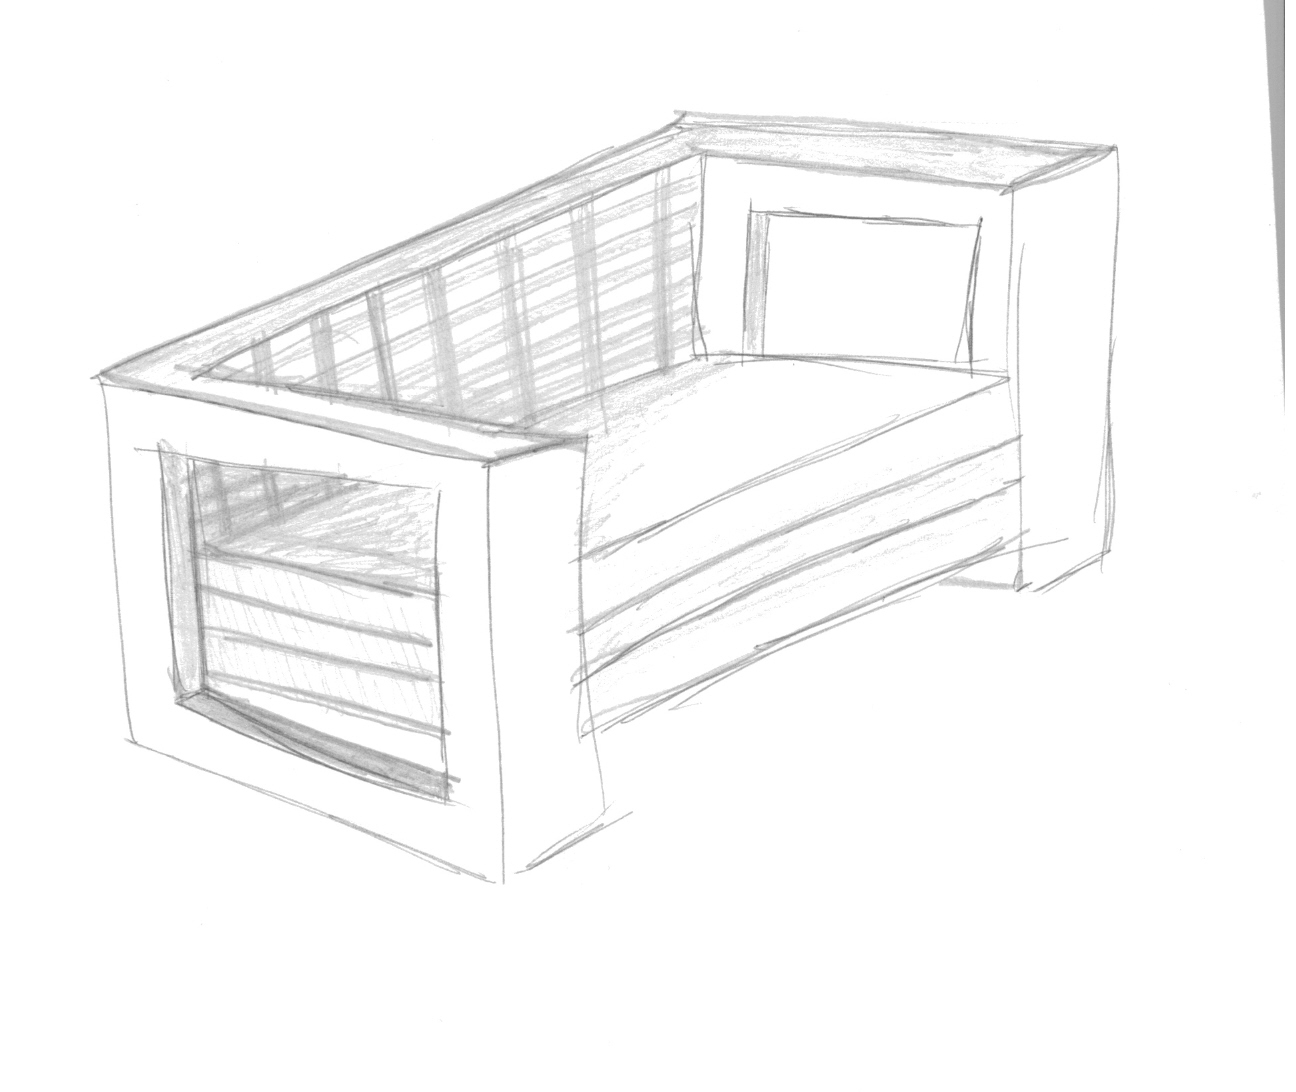 Ashley Korzen Week 9 Sketches Mig And Tig